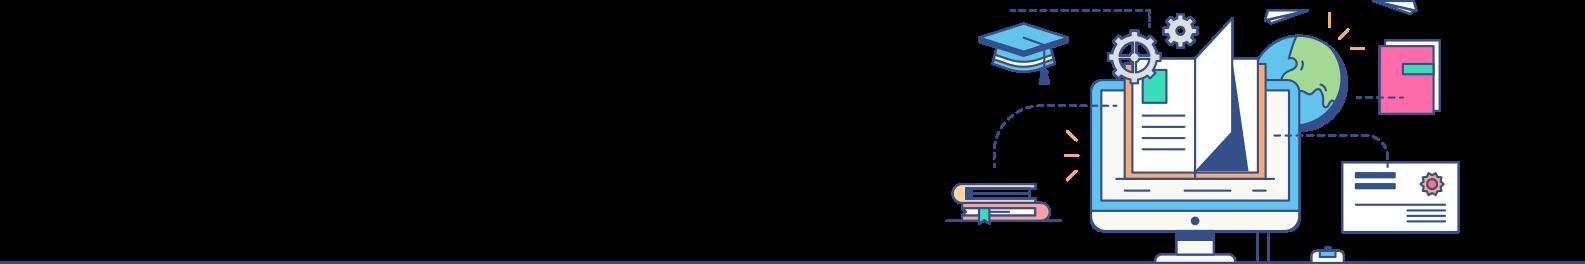 Background header-vector-1.png